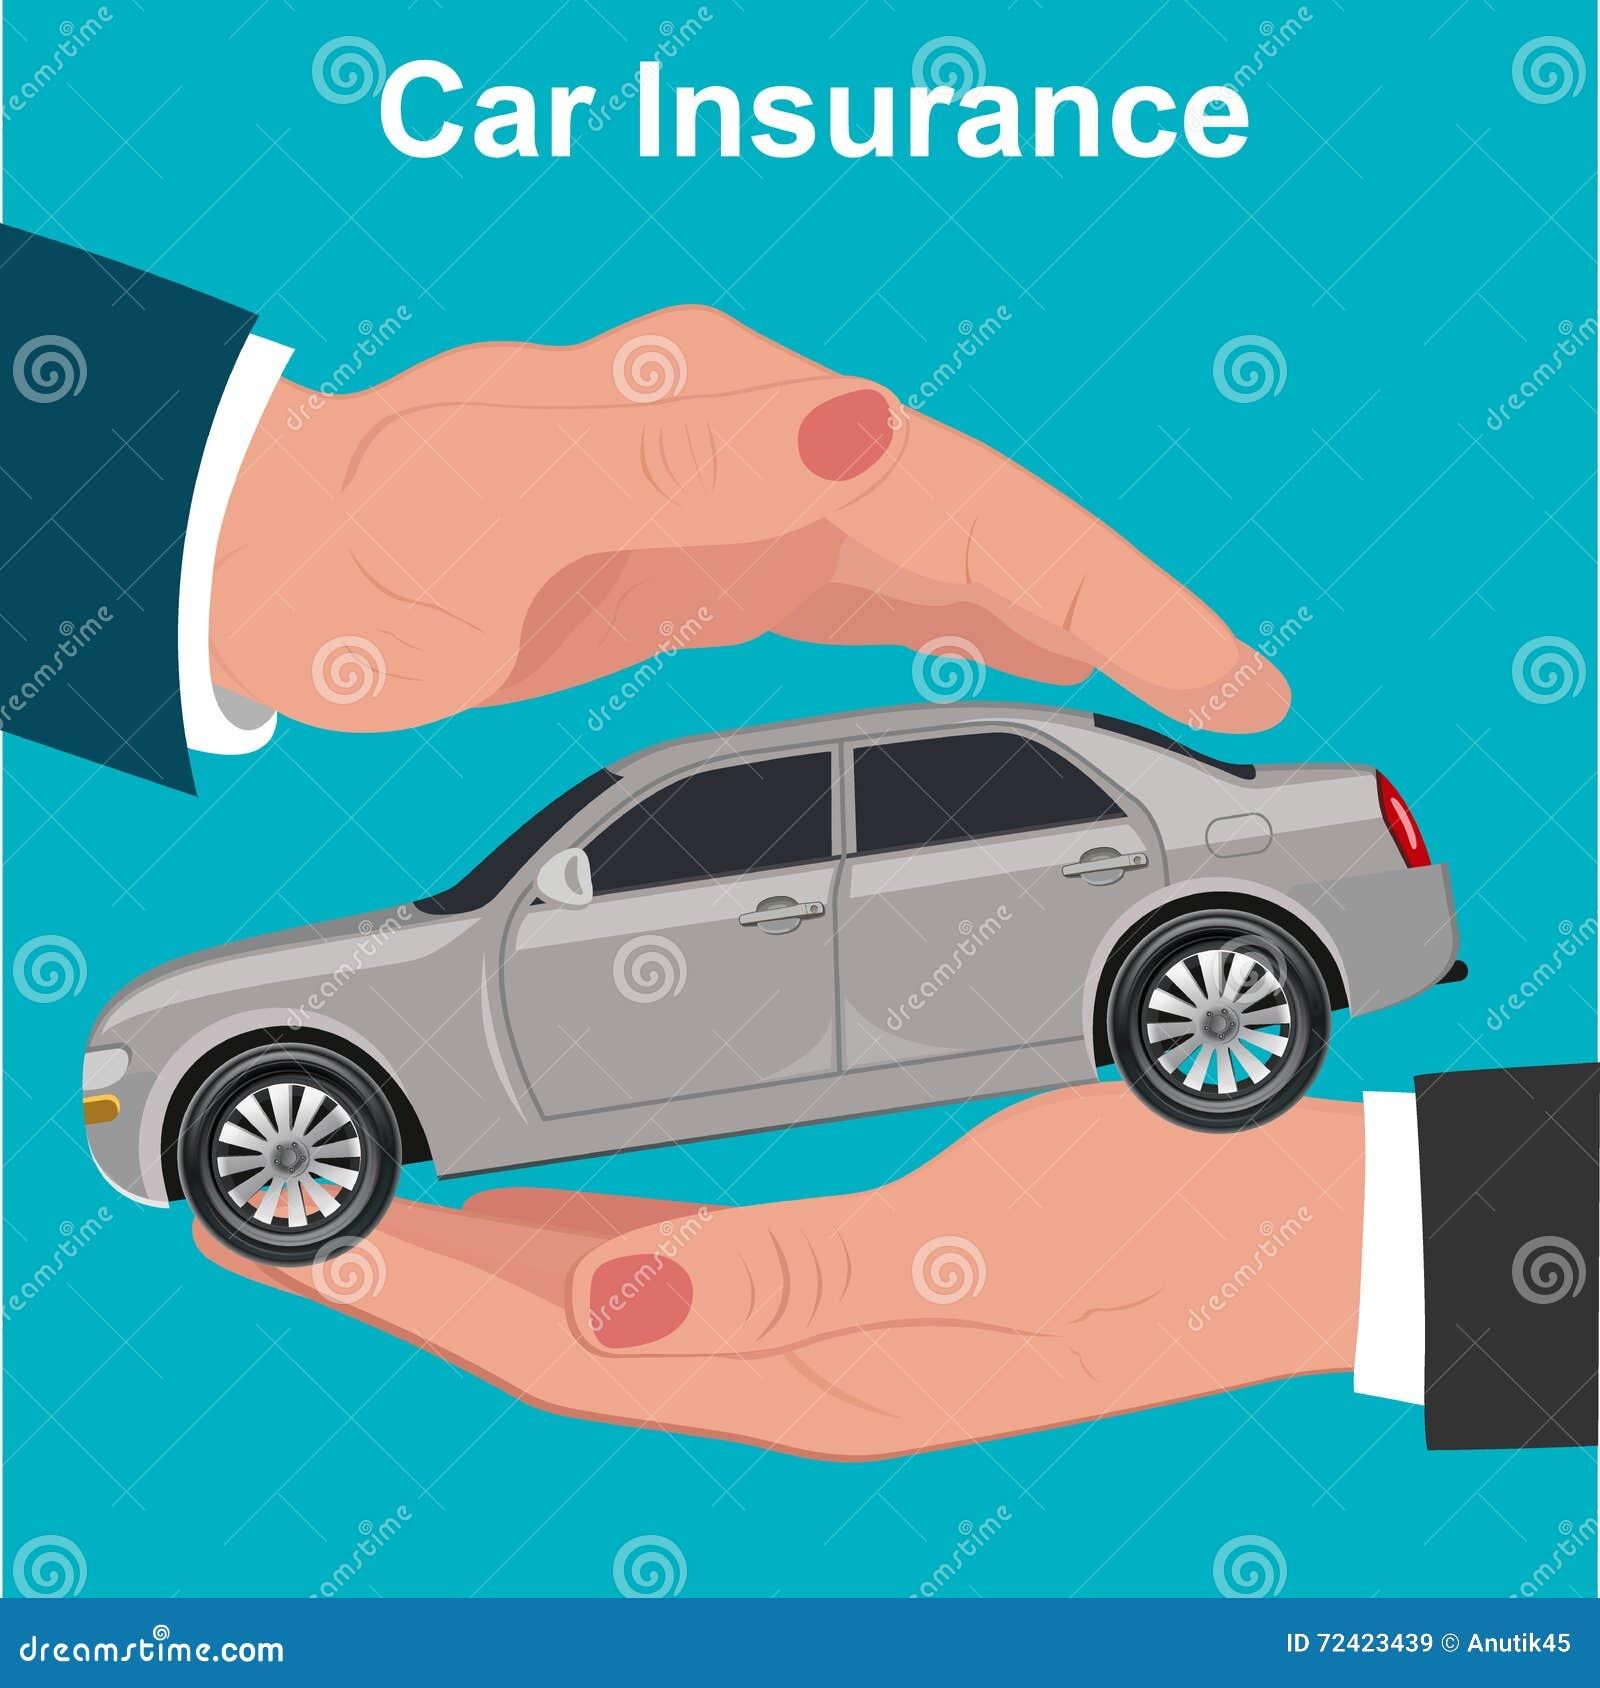 Car Insurance Concept Stock Image